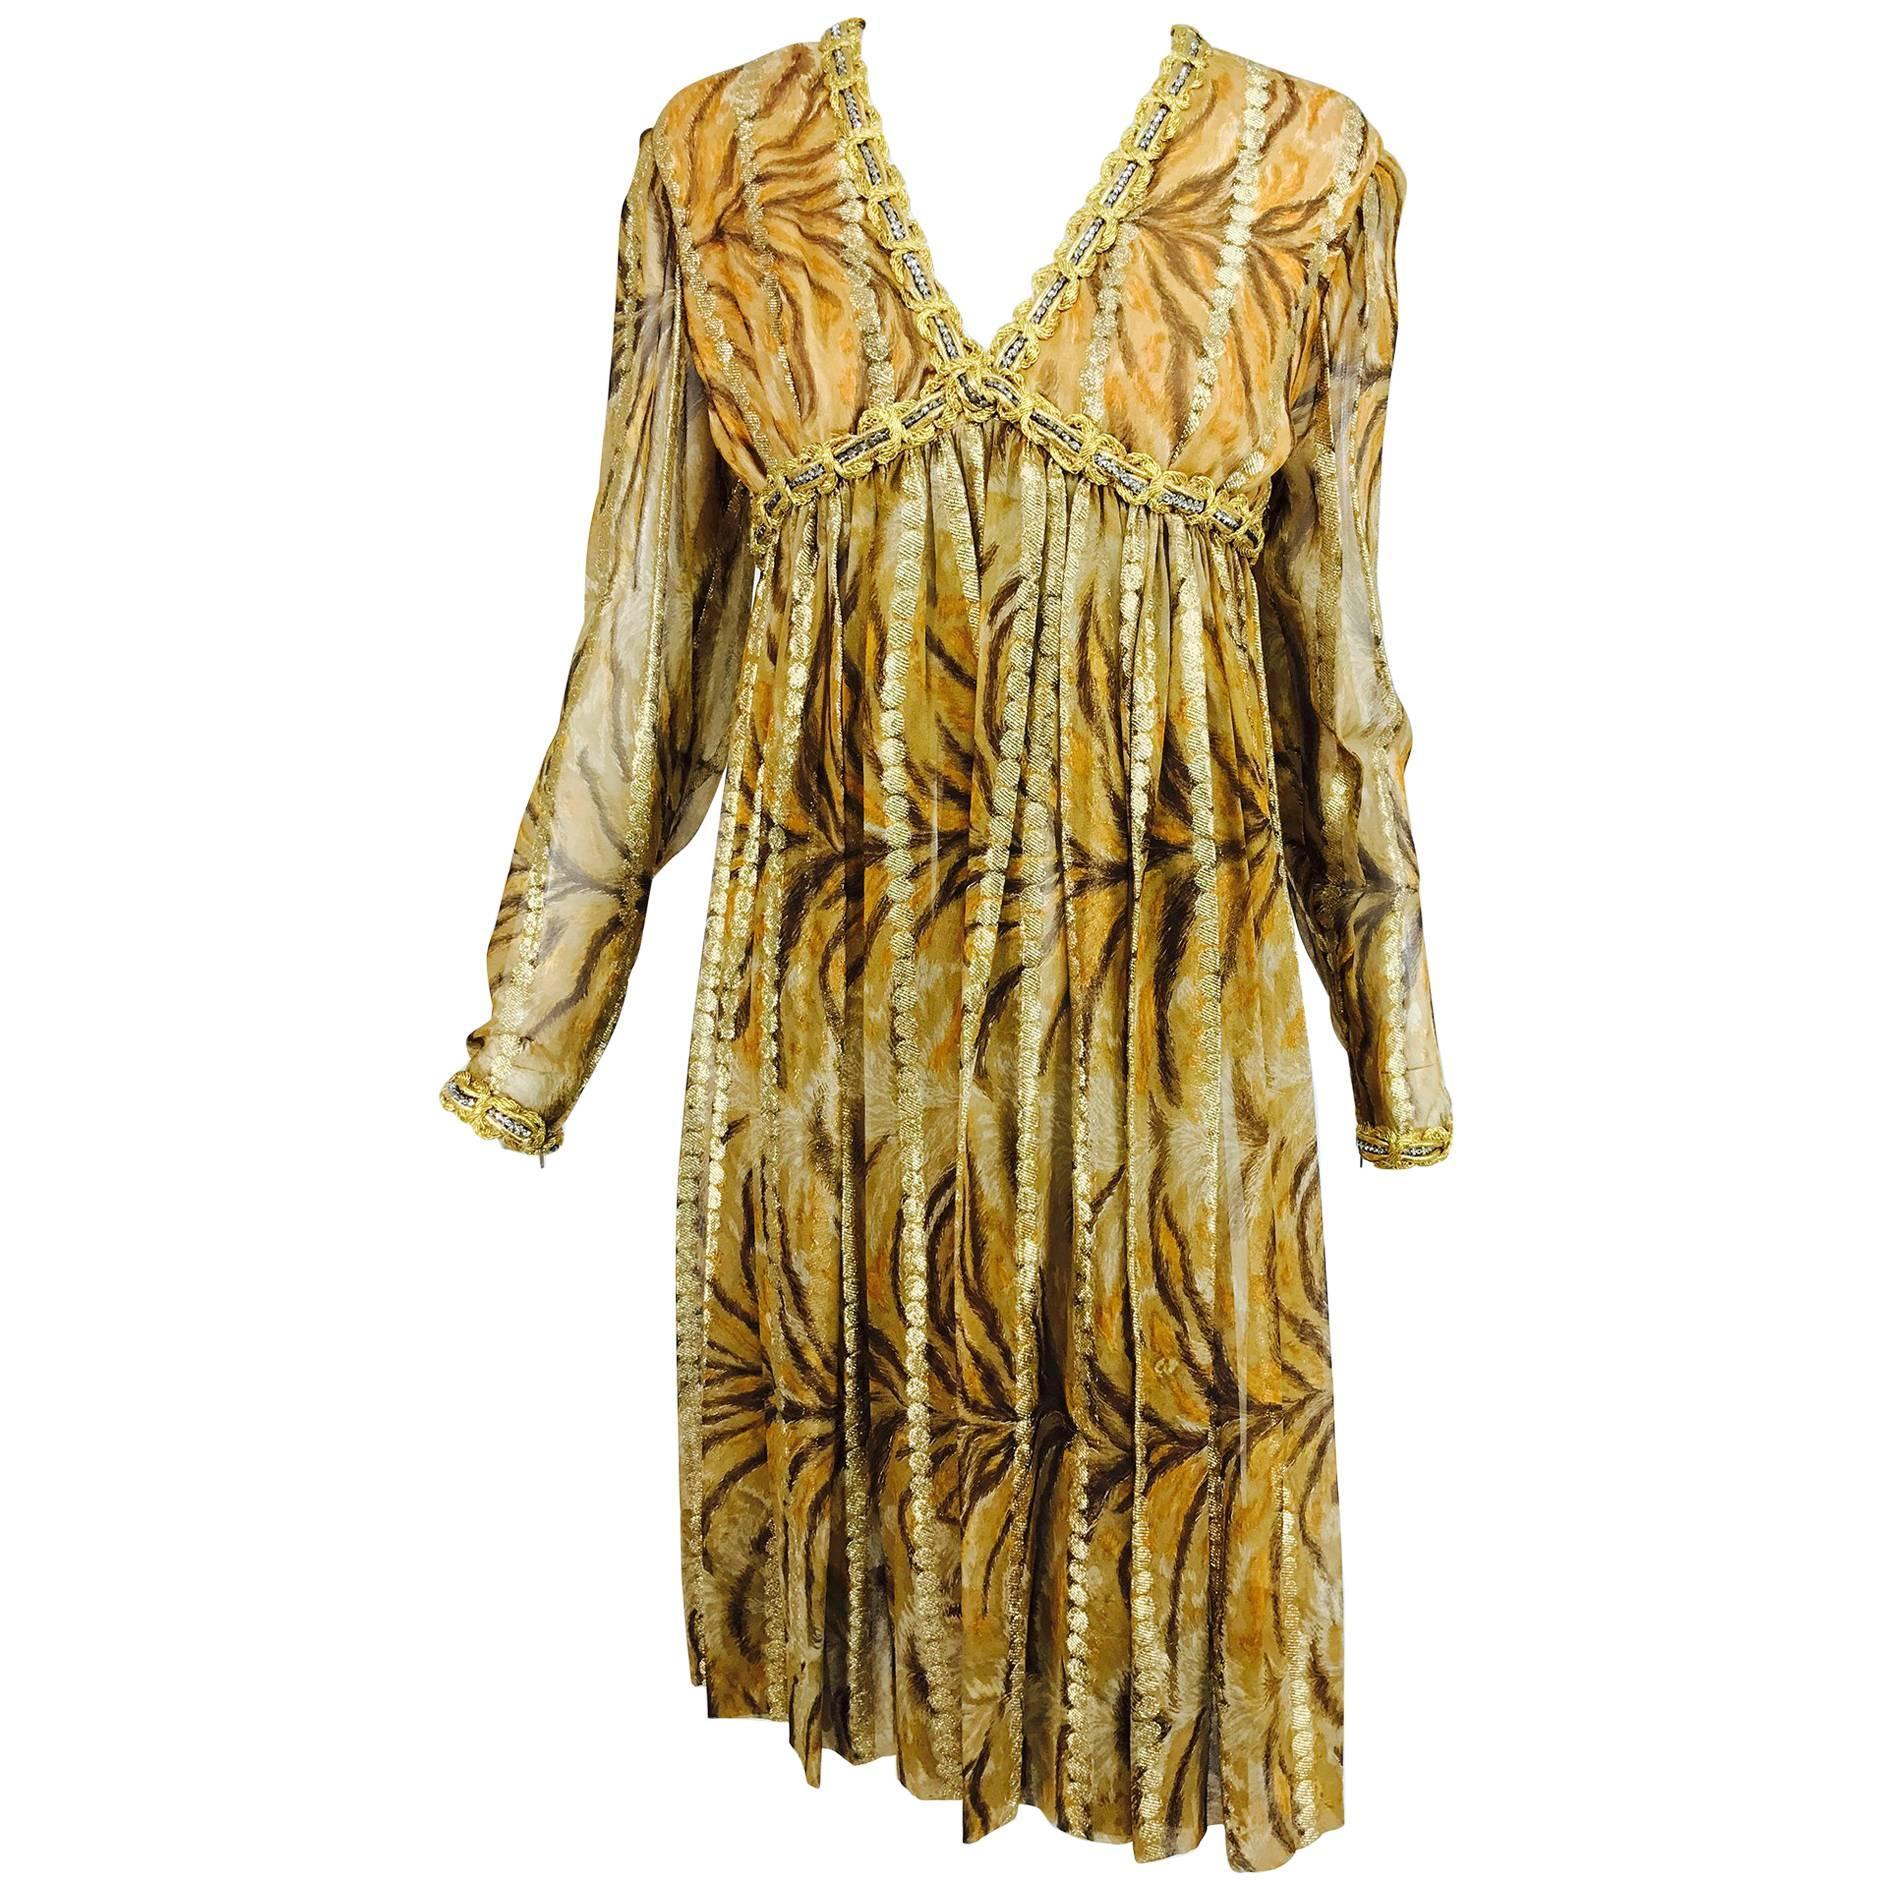 Vintage Bill Blass golden silk chiffon metallic tiger stripe cocktail dress 1970